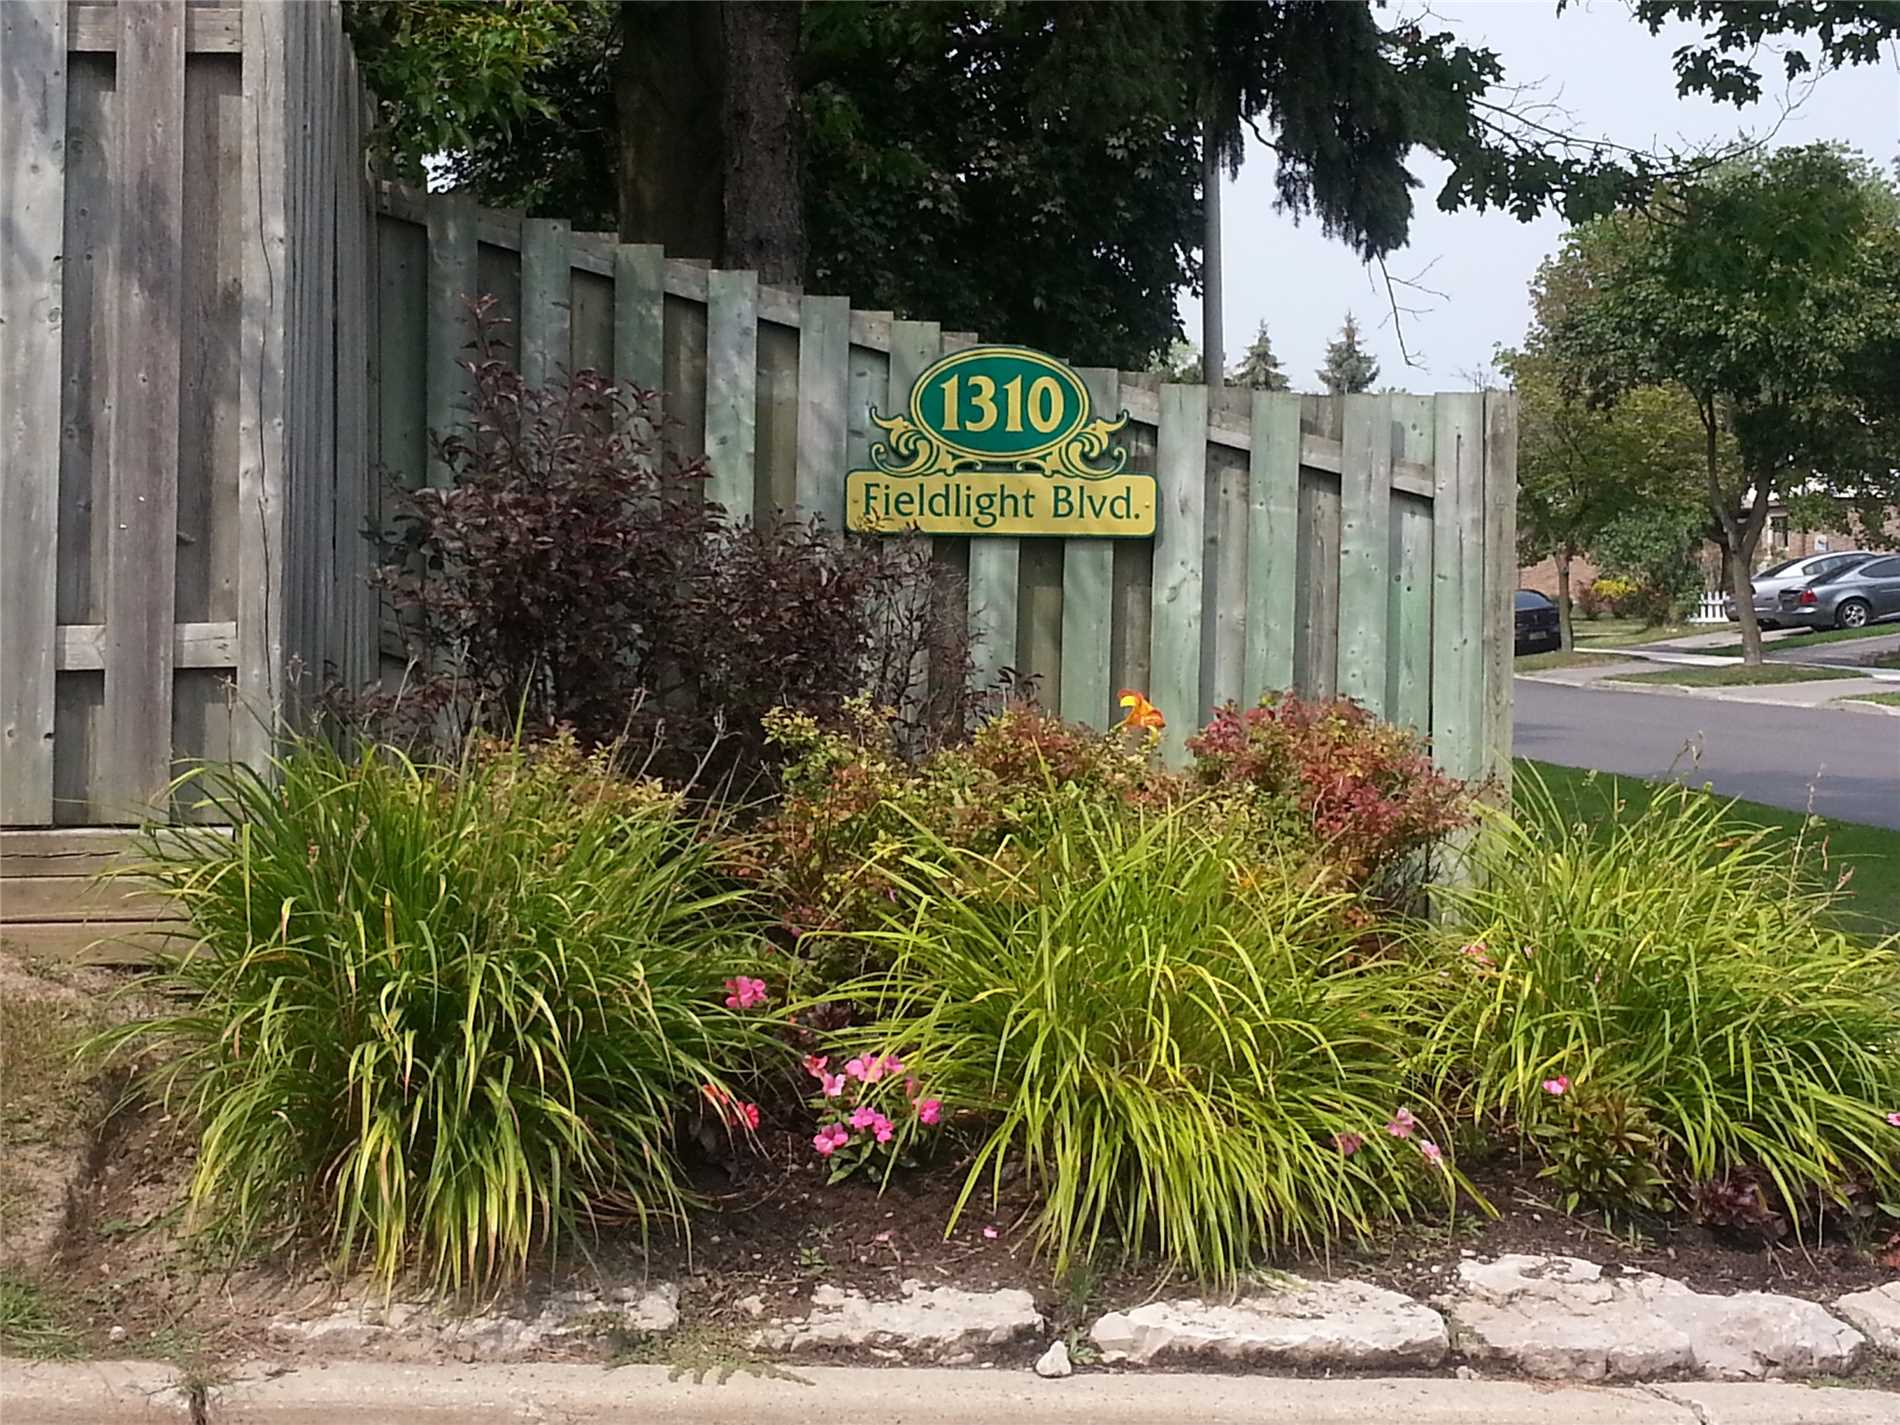 Buliding: 1310 Fieldlight Boulevard, Pickering, ON